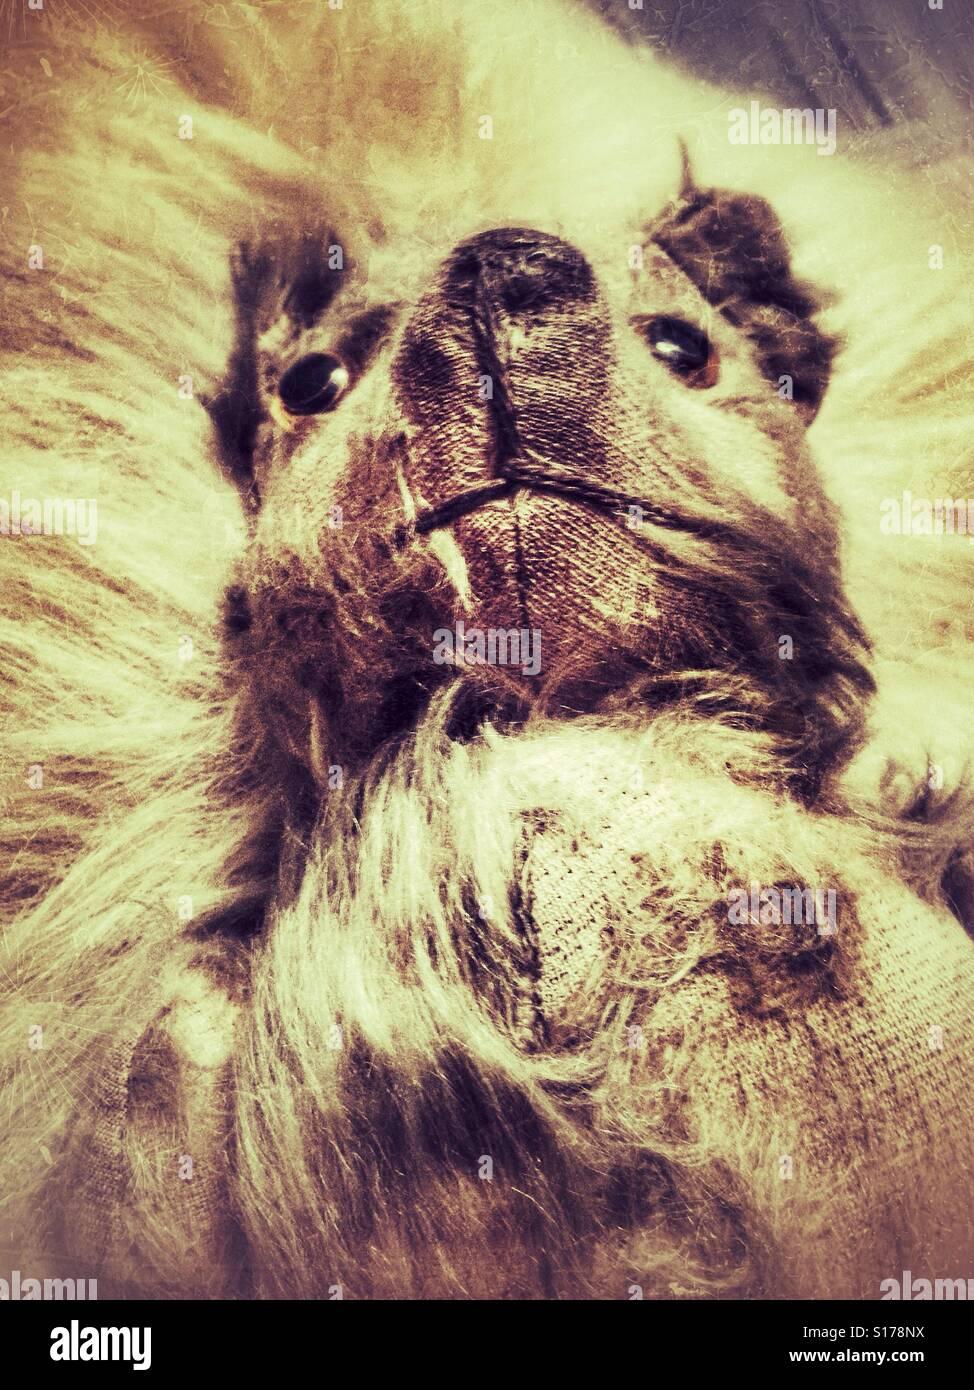 Sinister à ours vintage. Banque D'Images